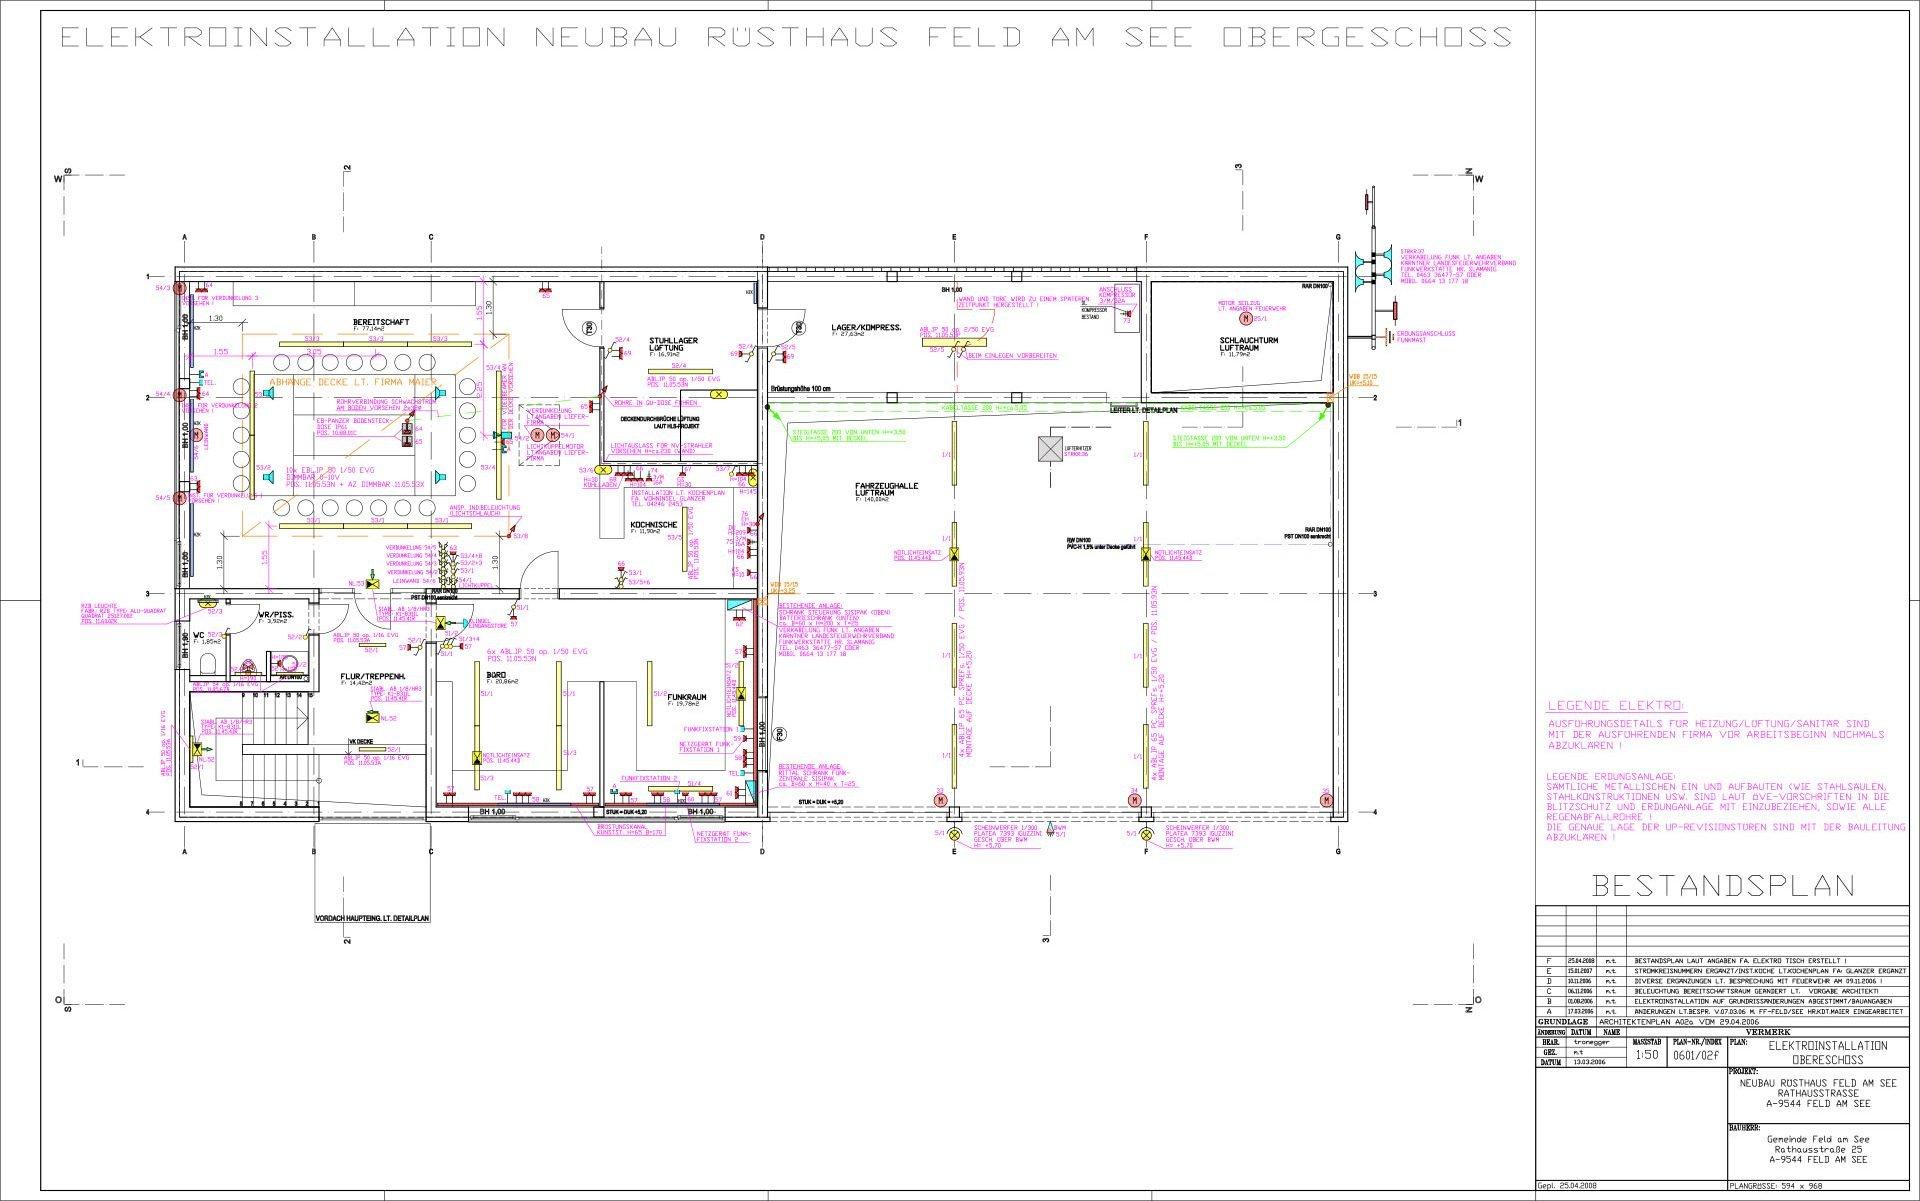 FF-Feld-am-See-Elektroinstallation_2